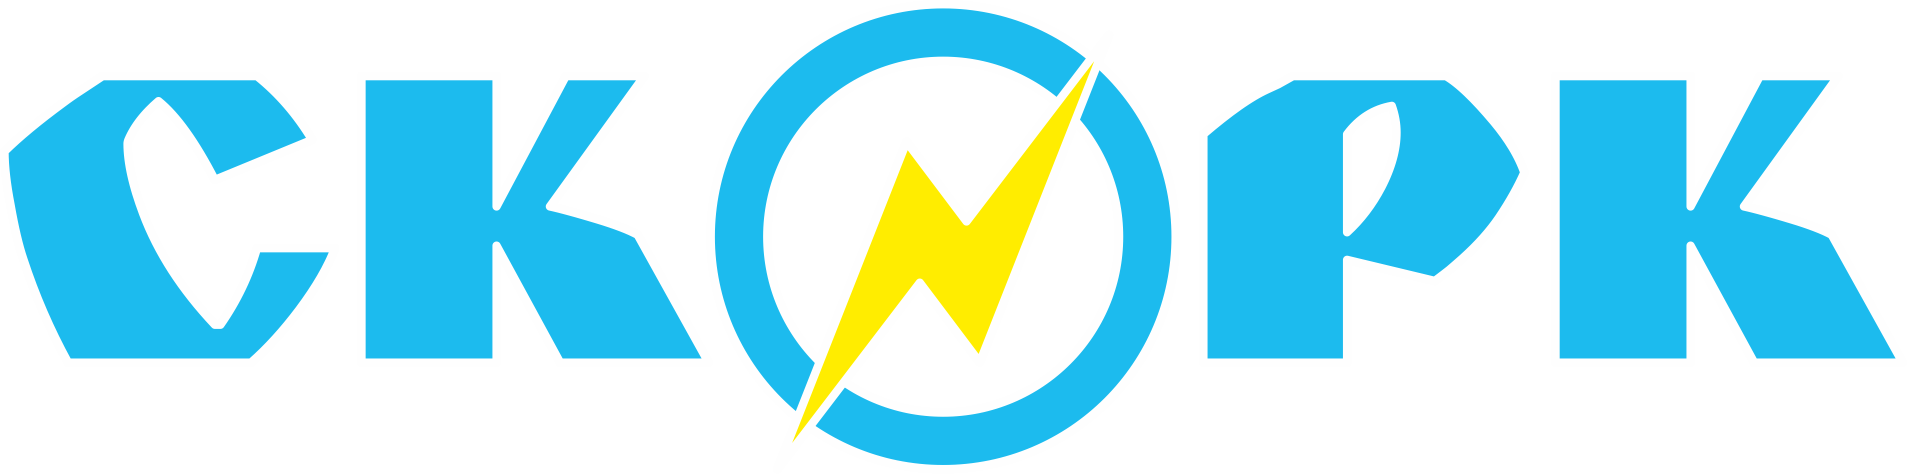 Скорк Електрообладнання та електротовари